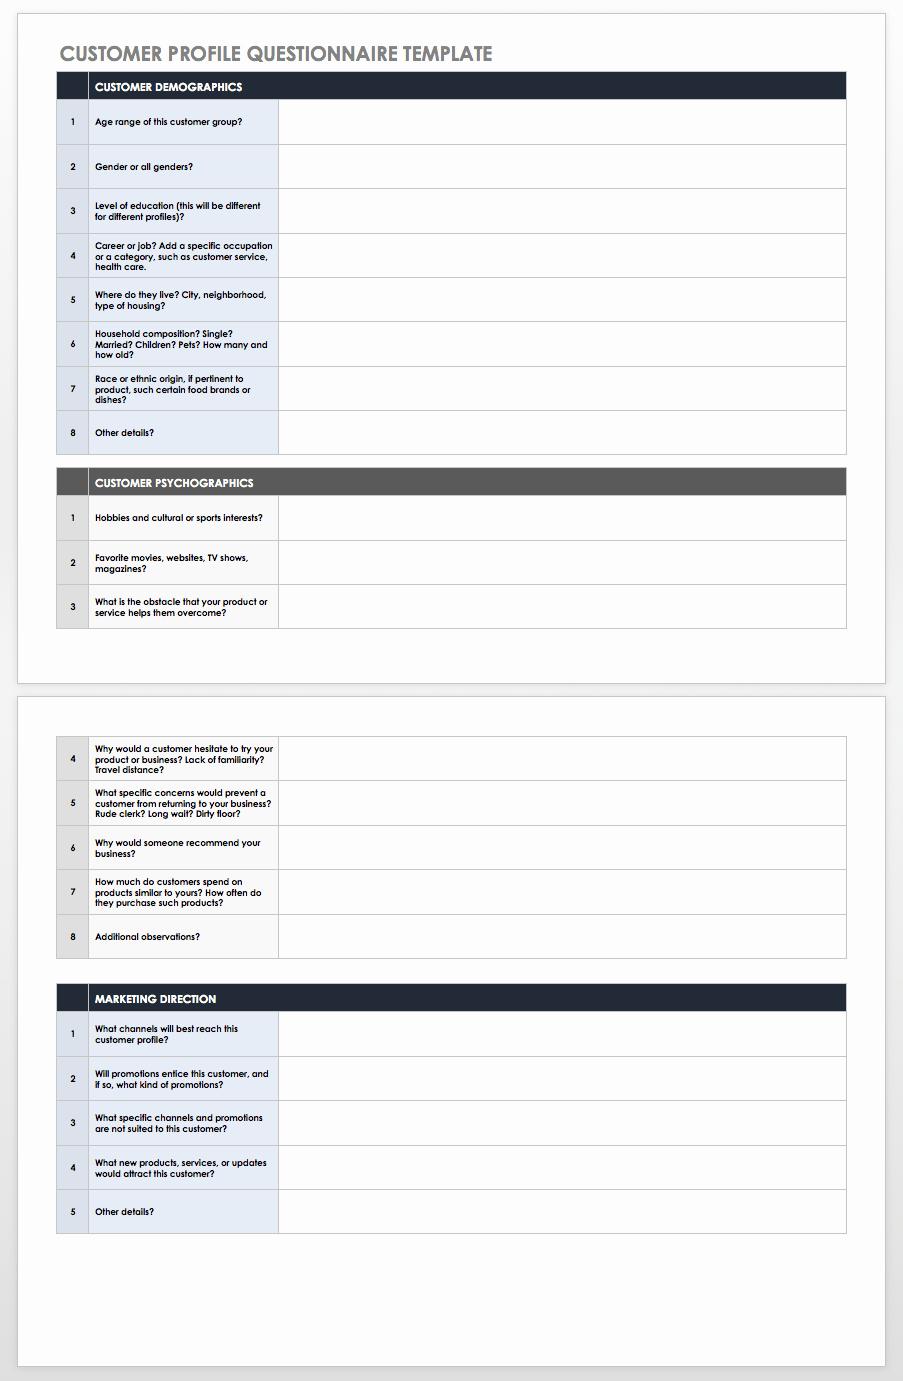 Customer Profile Template Excel Beautiful Free Customer Persona & Profile Templates